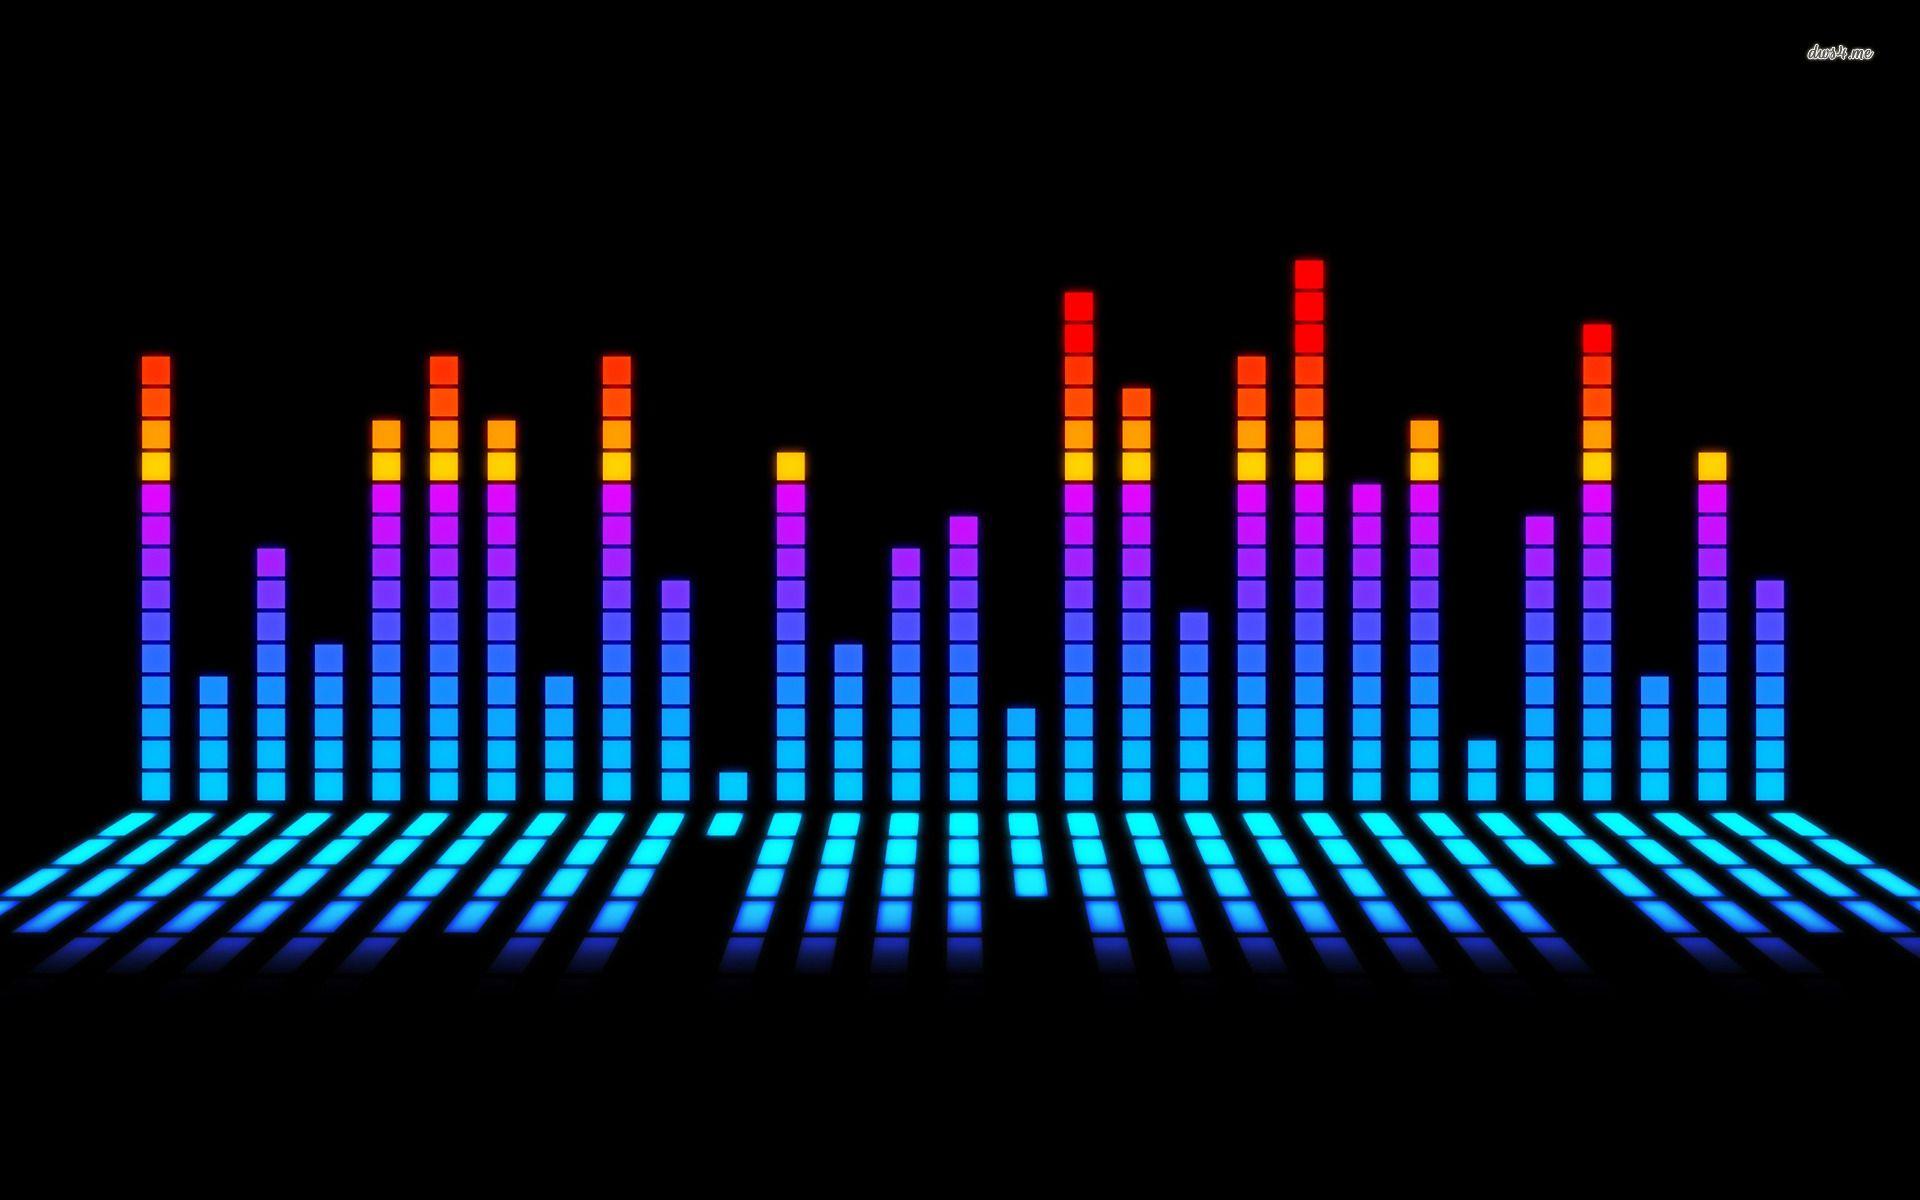 Blue Music Equalizer Hd Wallpaper Google Search Hiburan